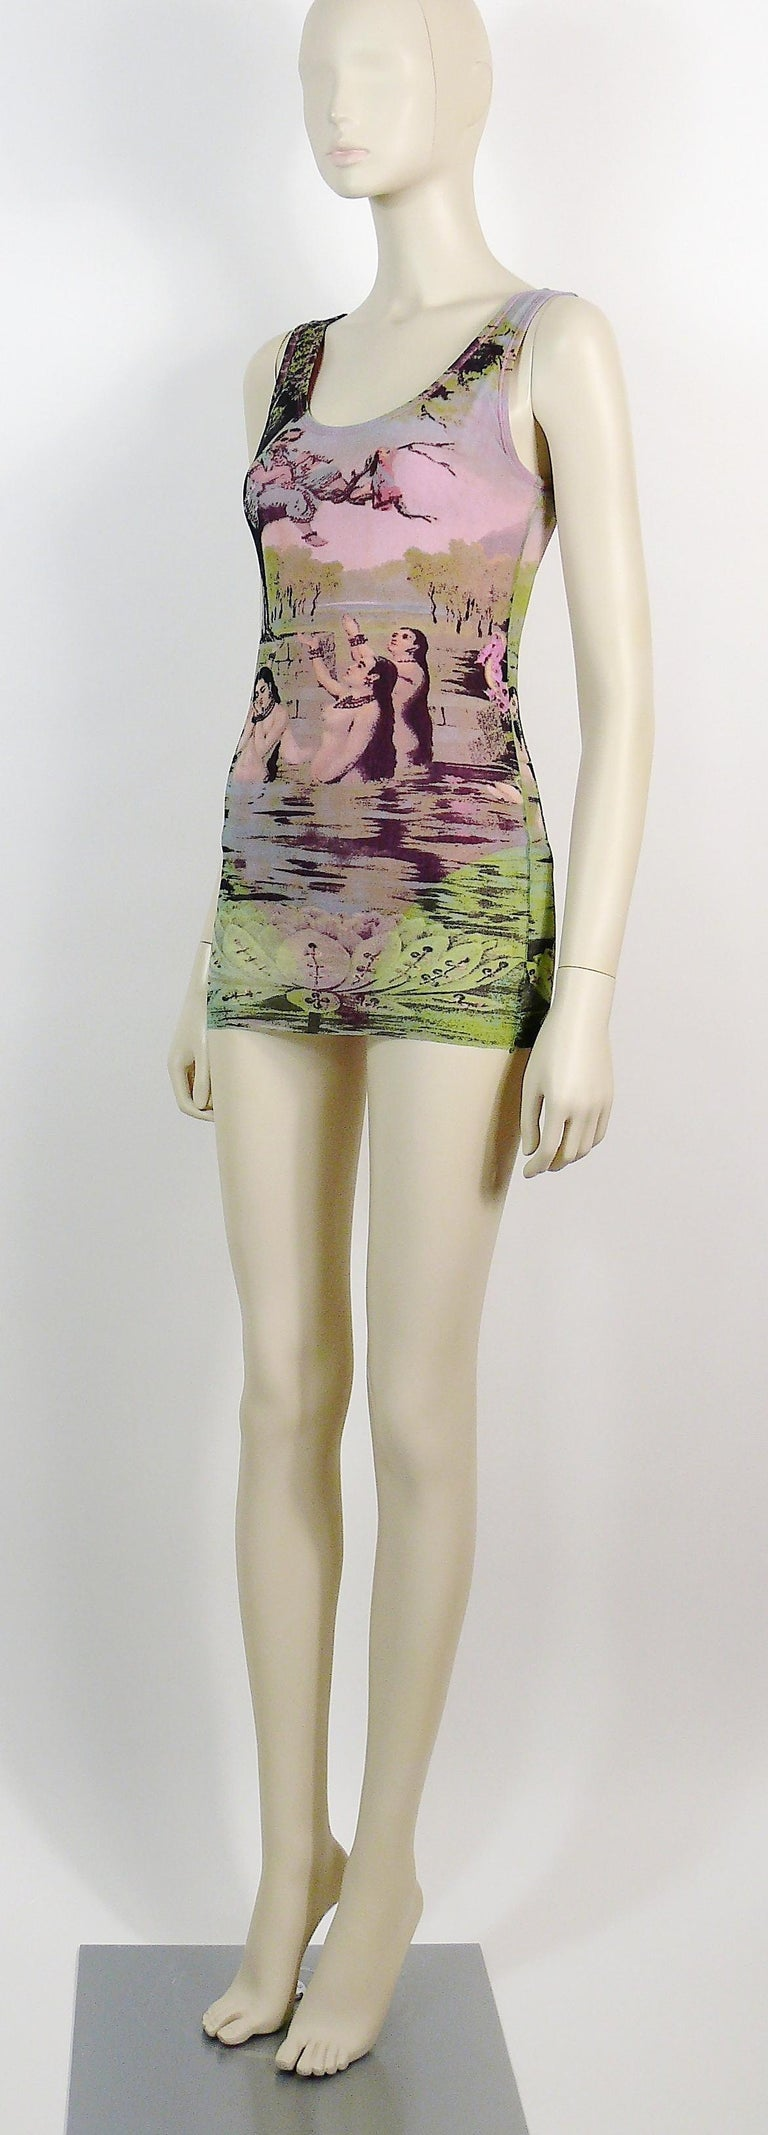 Jean Paul Gaultier Vintage Oriental Bath Print Mesh Tank Micro Mini Dress Size L For Sale 1